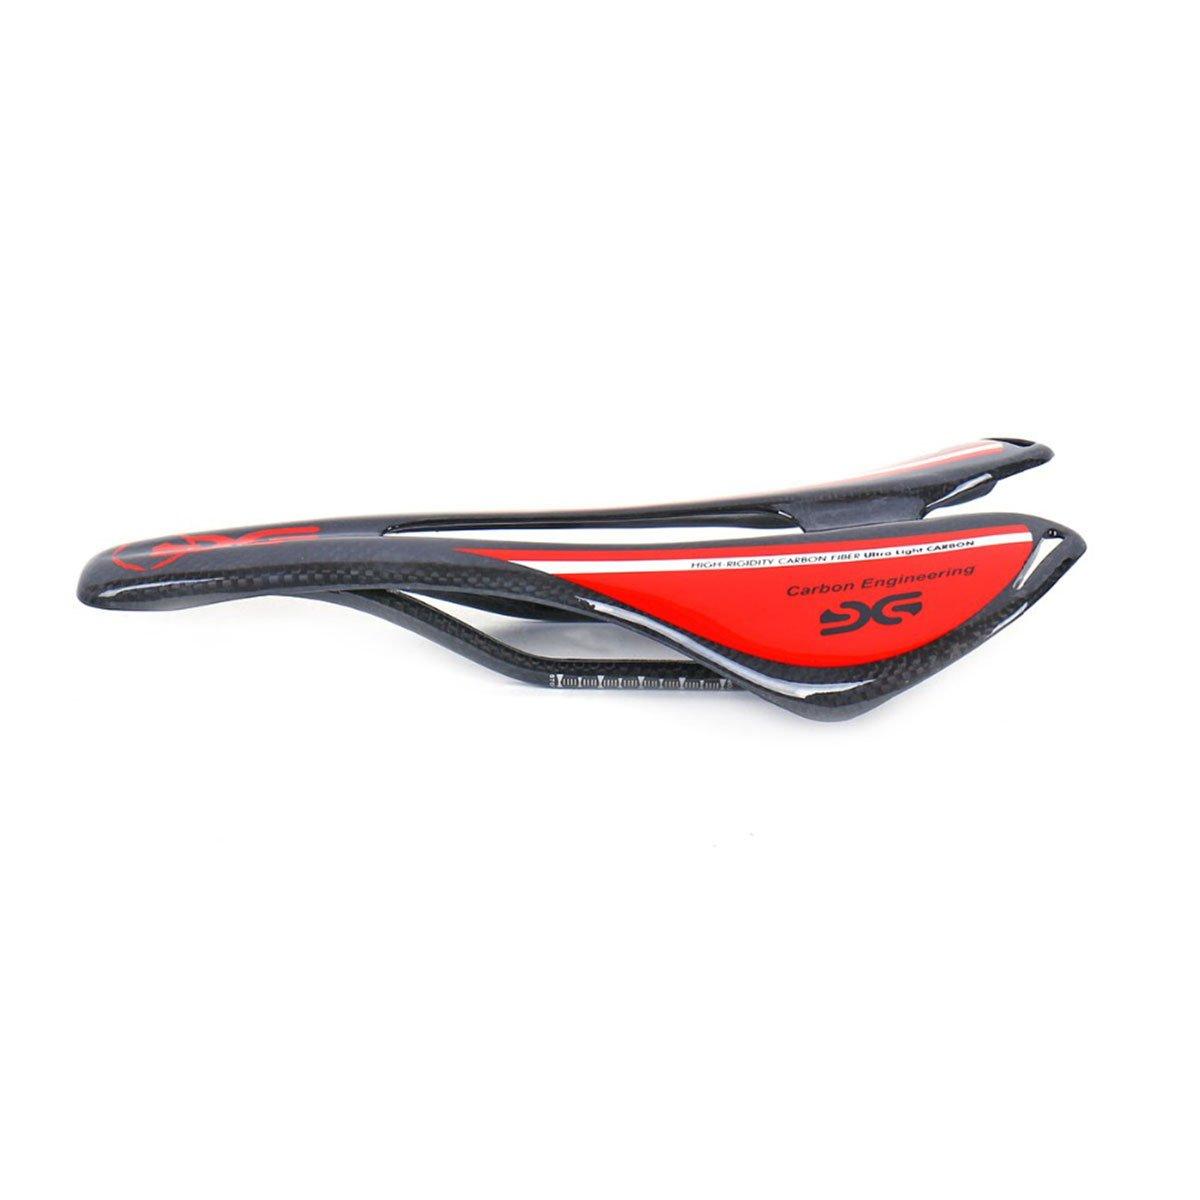 ELITA ONE Super ligero de fibra de carbono Ciclismo Sillines,bicicleta de carretera/bicicleta de montaña carbono Sillines,3K Rojo, verde, azul(Brillante) (Rojo) Ltd.